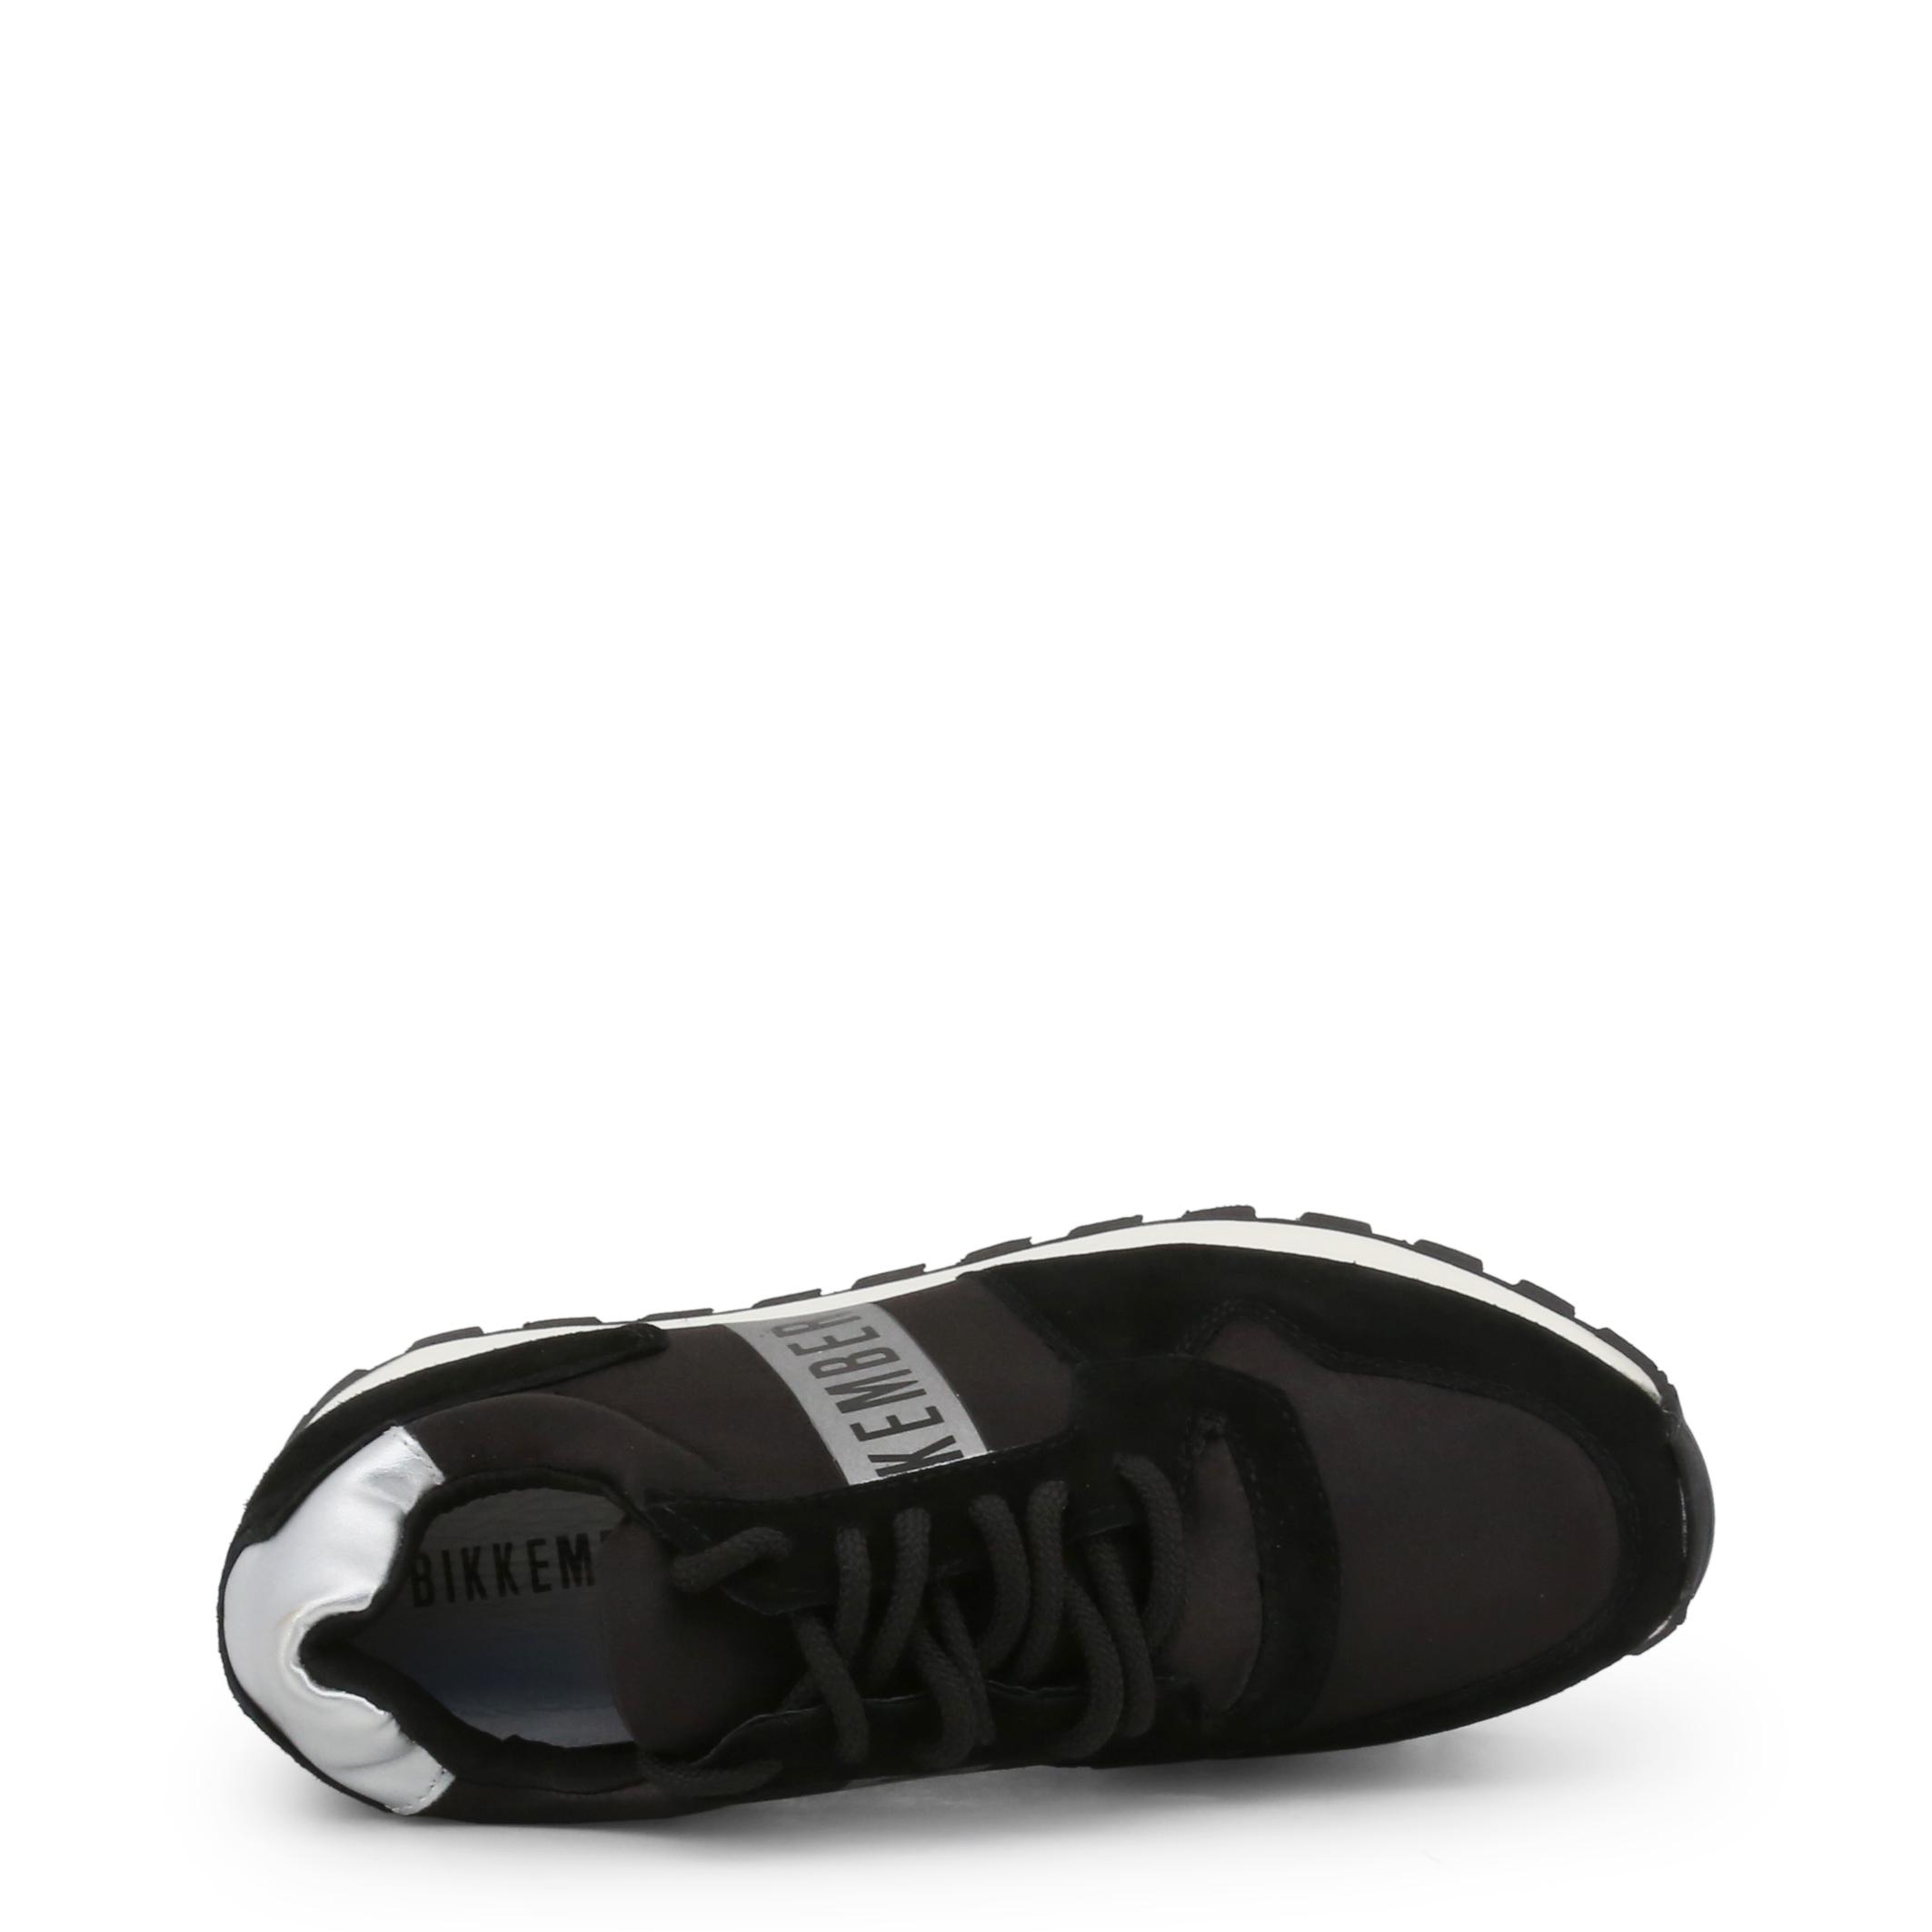 Baskets / Sneakers  Bikkembergs FEND-ER_2087 black